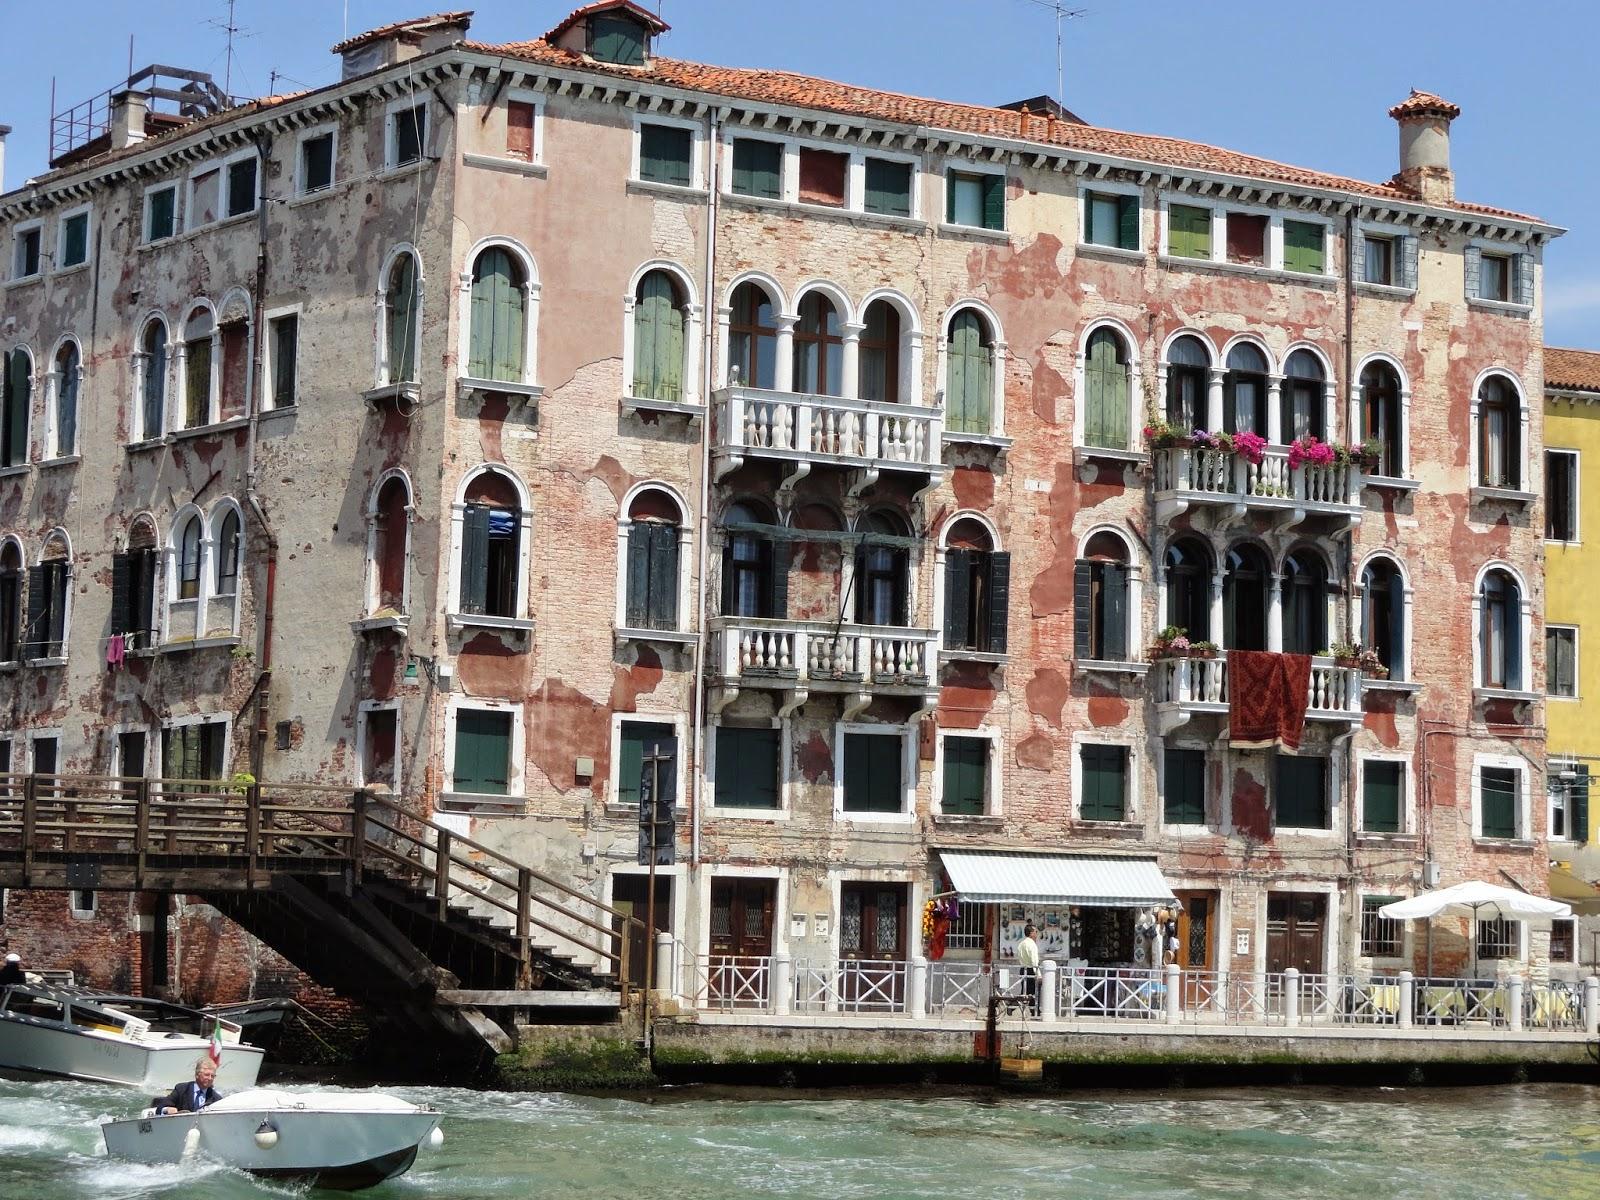 Venice-By-Vaporetto-Corinna-B